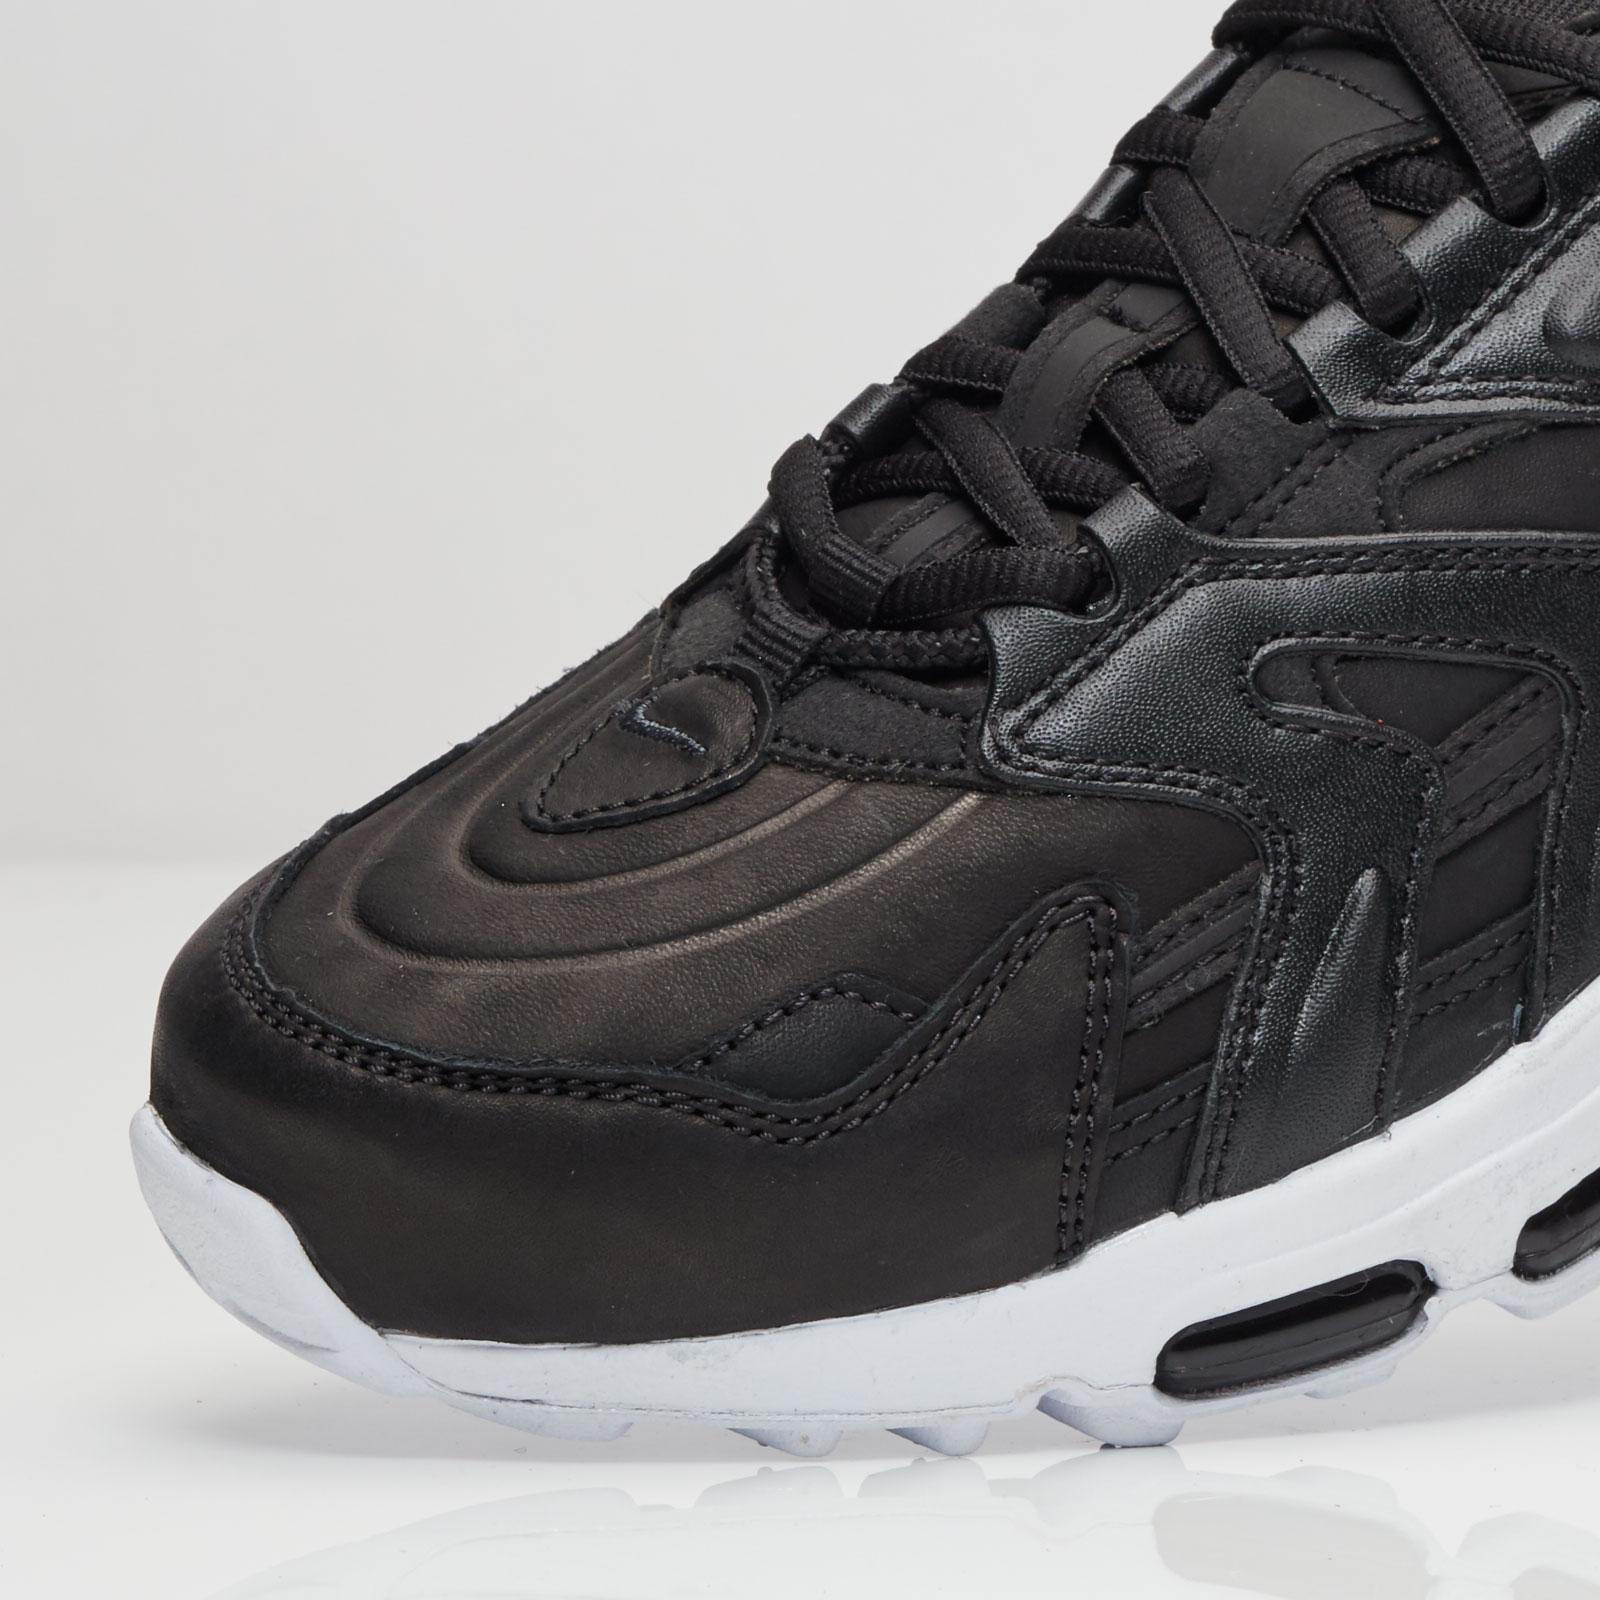 Nike Air 870166 Max 96 Ii Xx 870166 Air 001 Chaussuressnstuff ChaussuresEt 070a1f